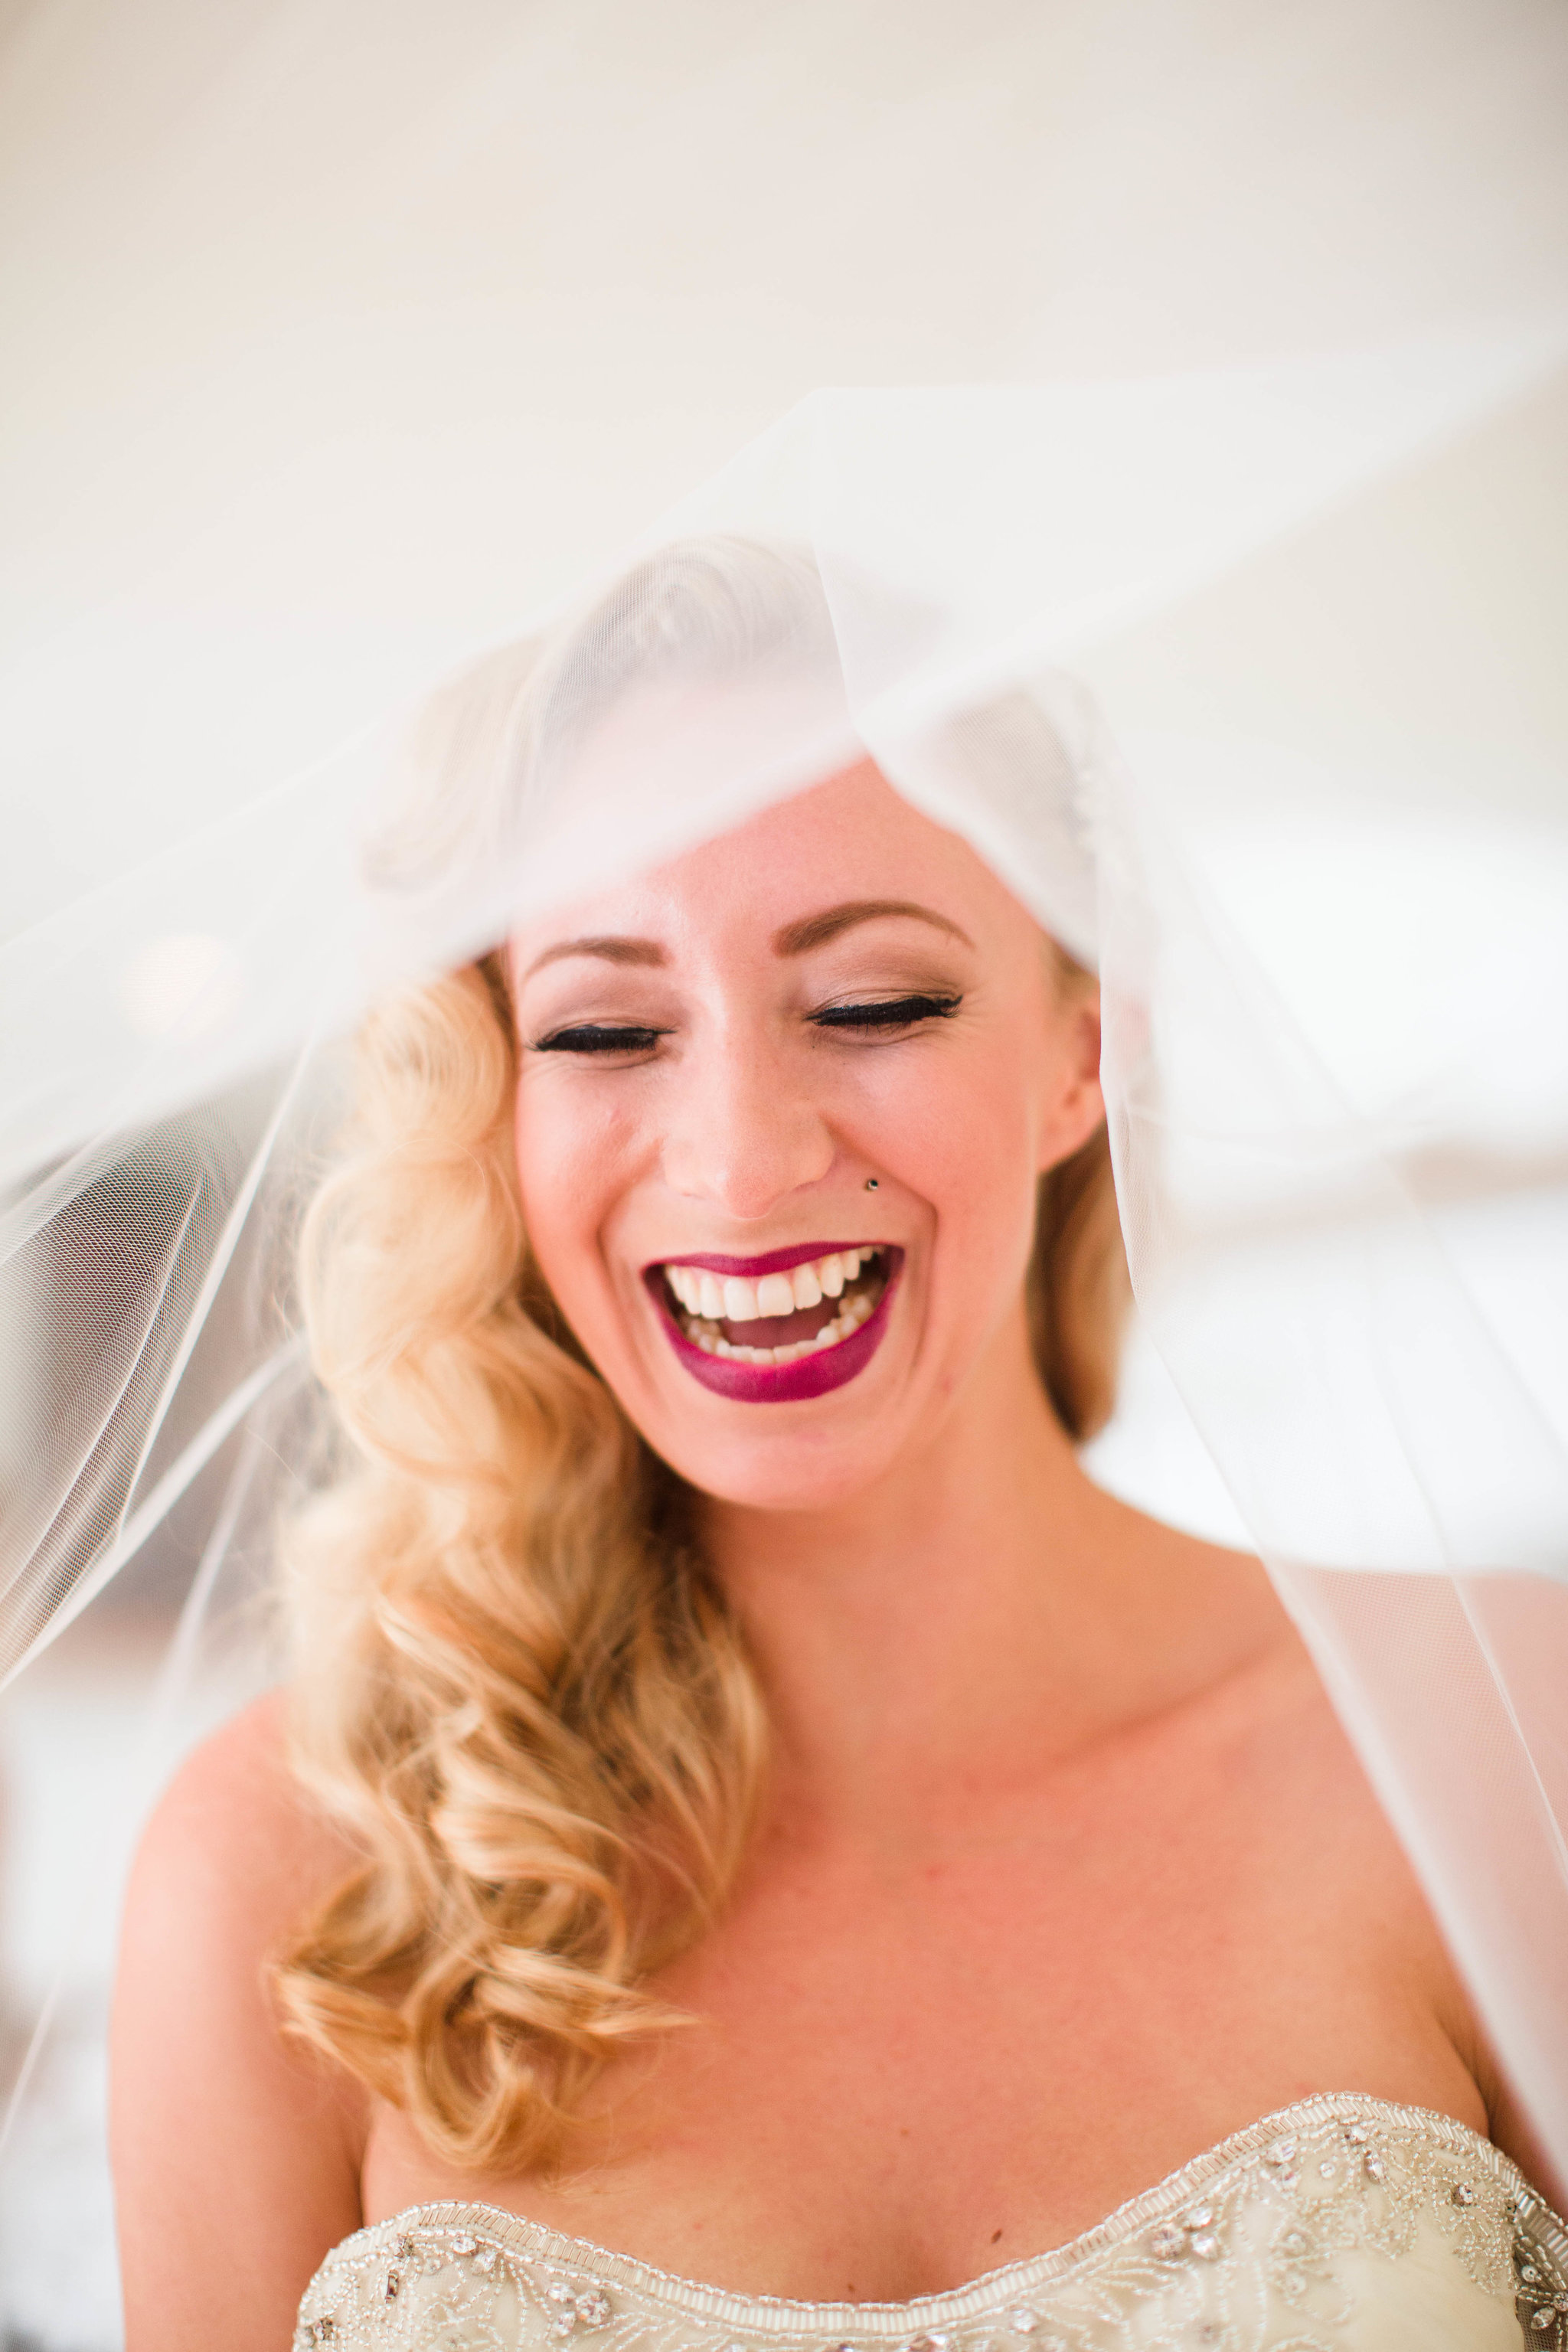 bellingham-wedding-backayard-by-seattle-wedding-photographer-adina-preston-12.jpg